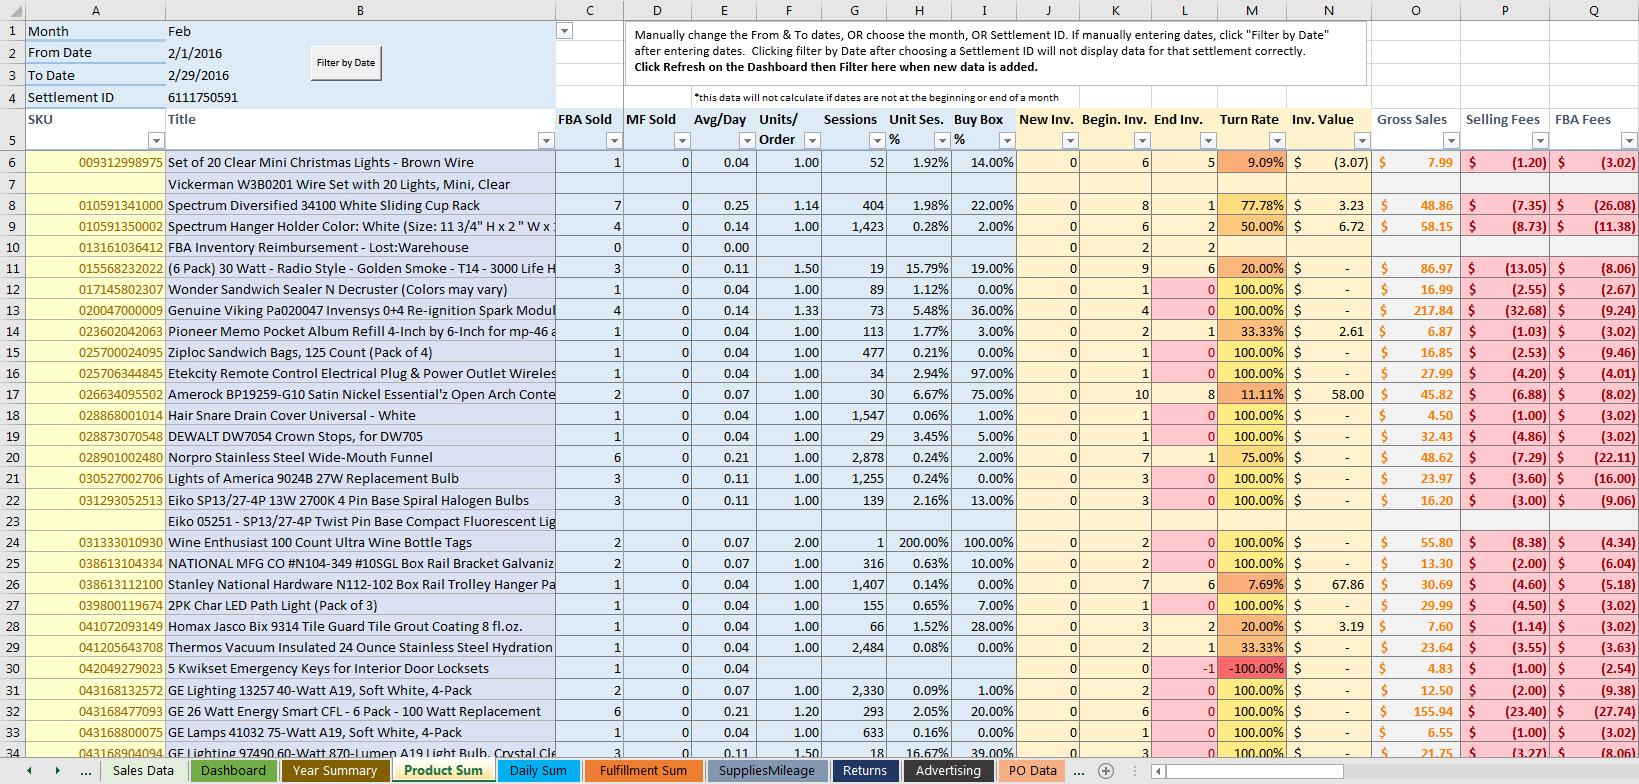 Amazon Profit Spreadsheet Regarding The Ultimate Amazon Fba Sales Spreadsheet V2 – Tools For Fba